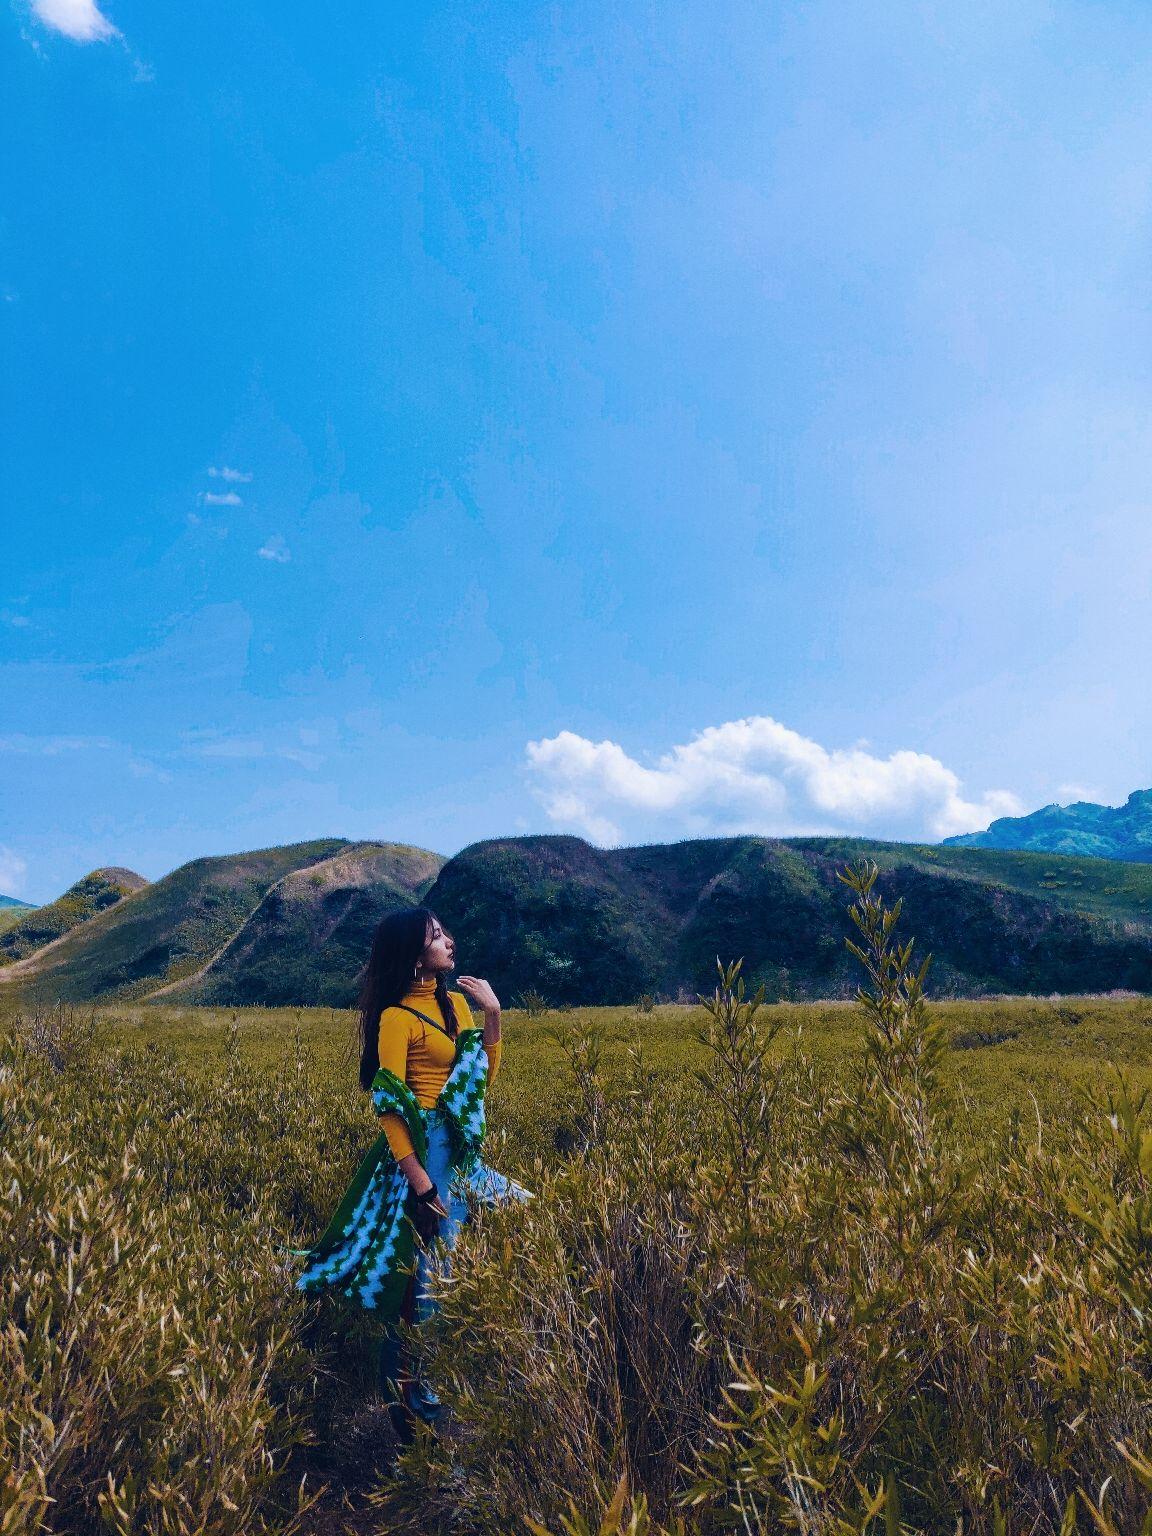 Photo of Dzükou Valley By Peri Brahma